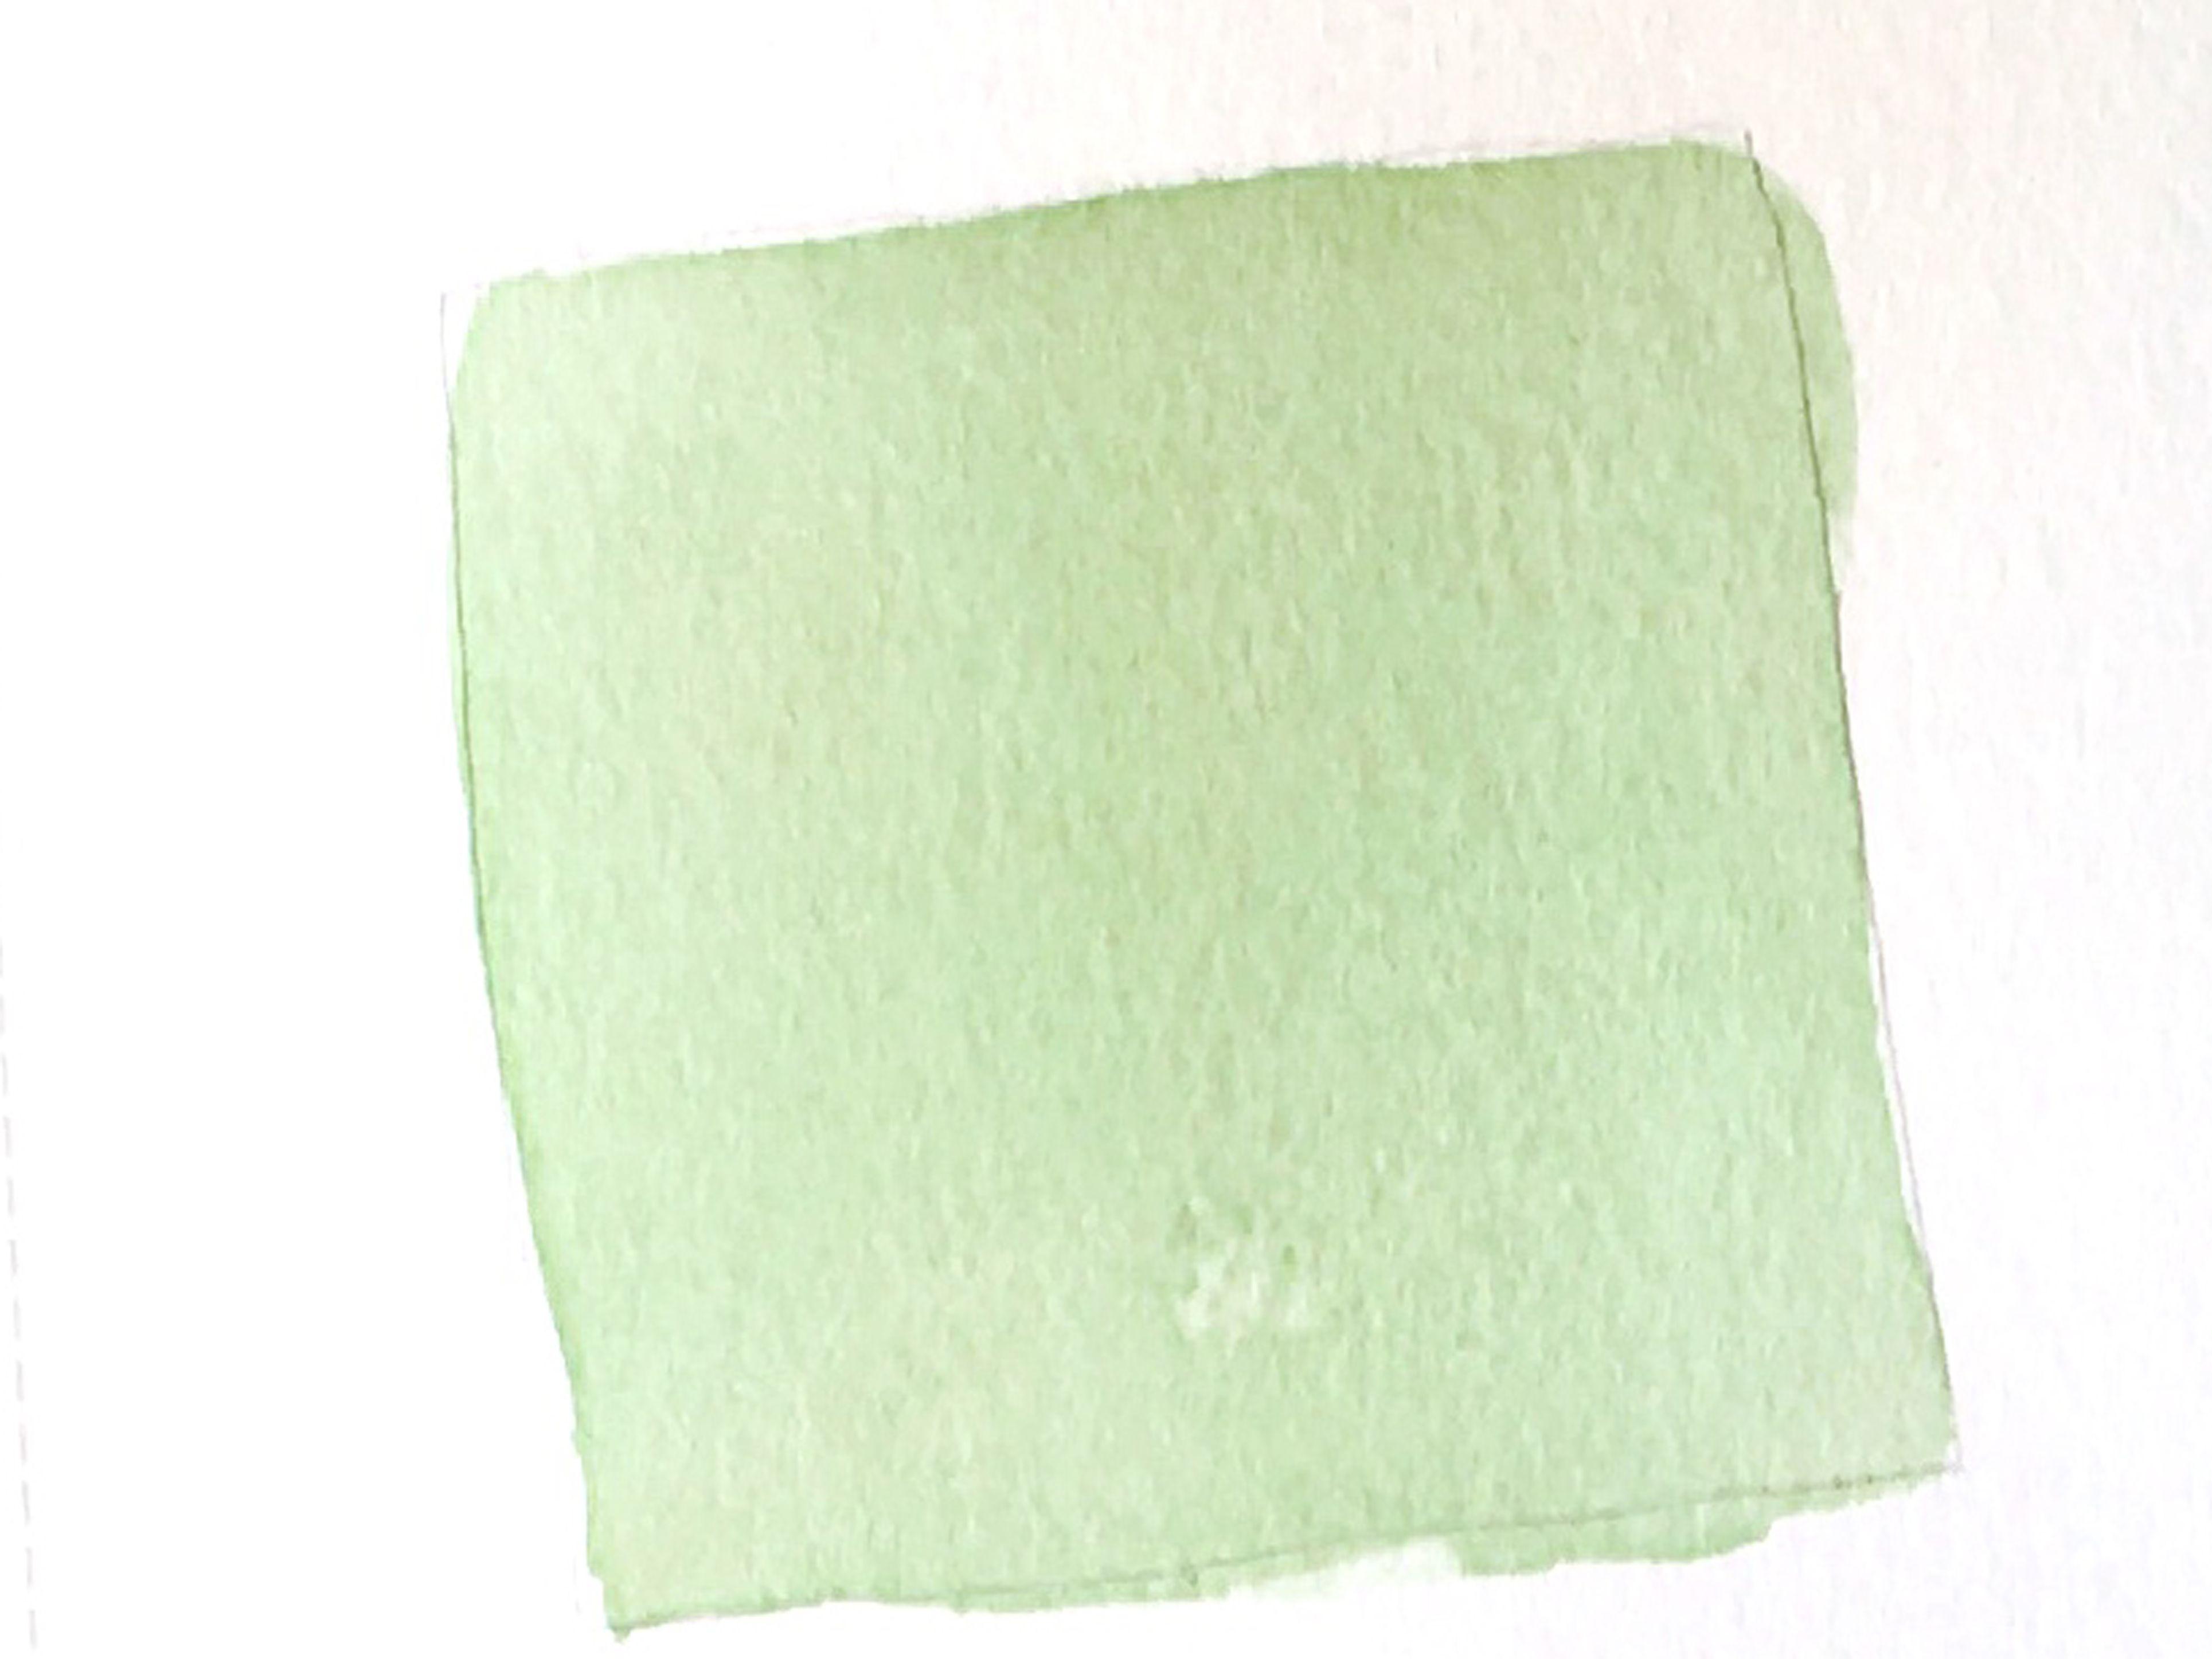 Recuadro de Acuarela de color verde sólido